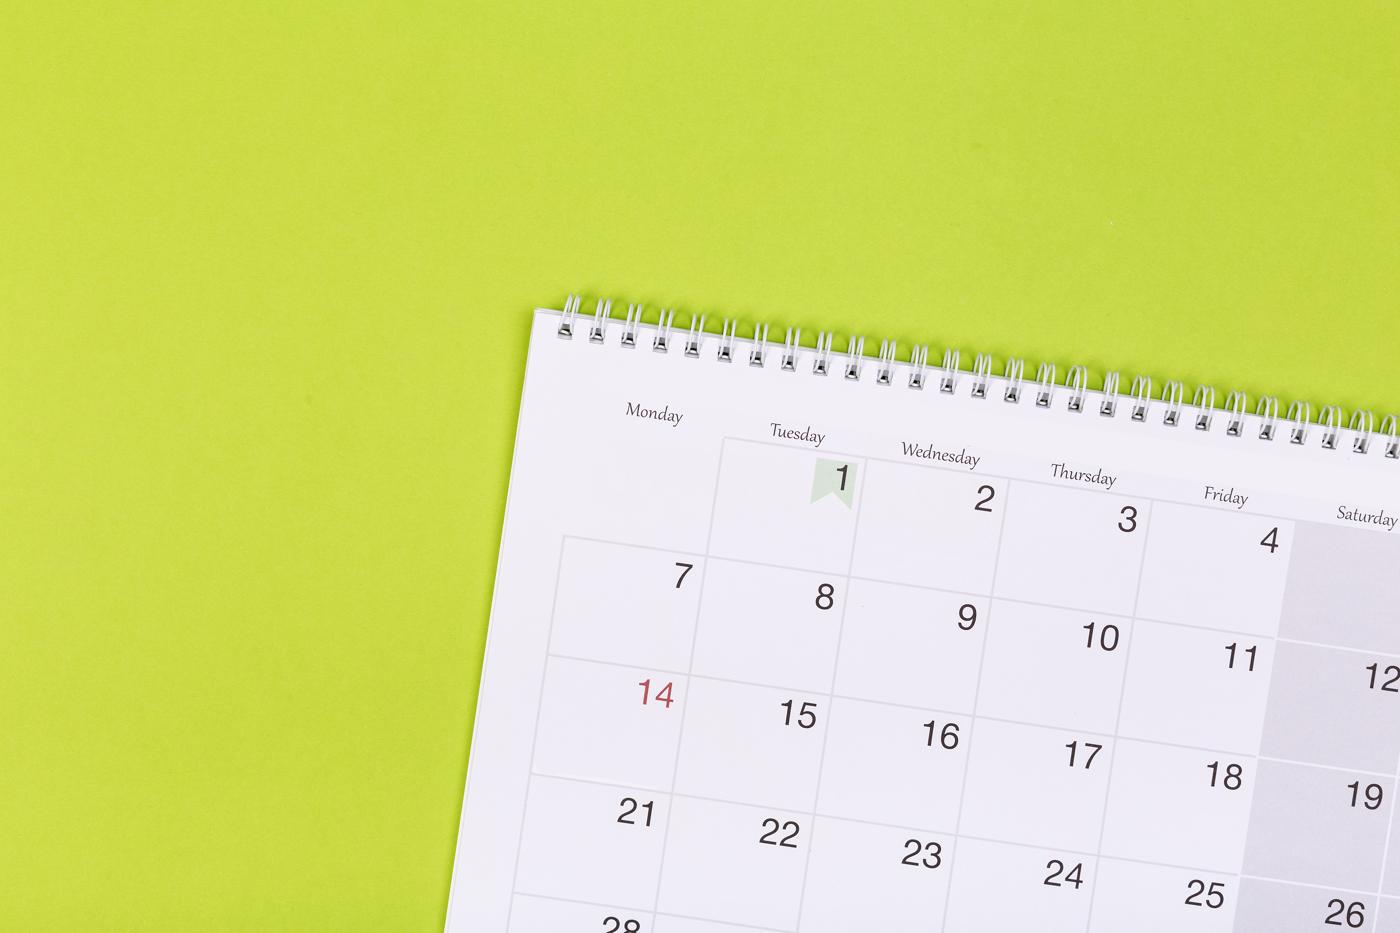 Stock market news, stock market news, stock market today, stock market calendar